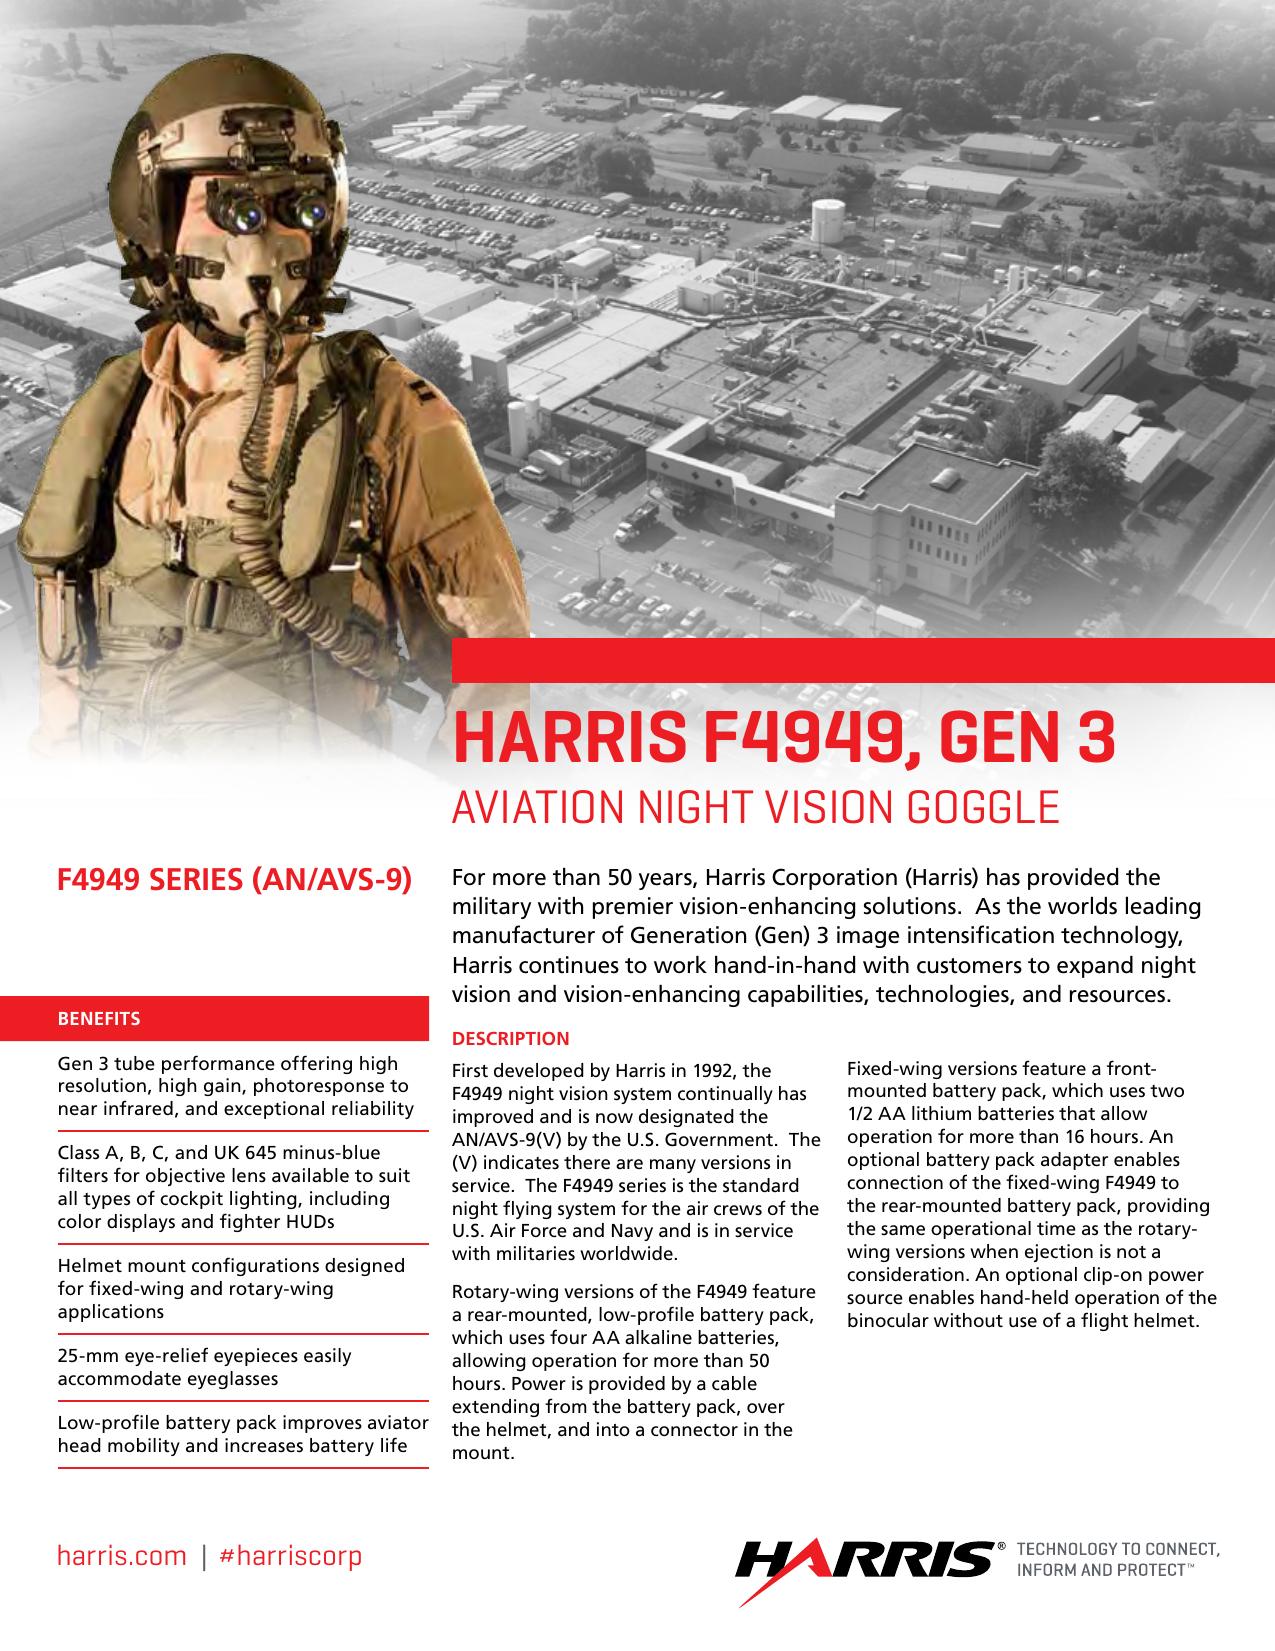 harris f4949, gen 3 - Harris Corporation | manualzz com